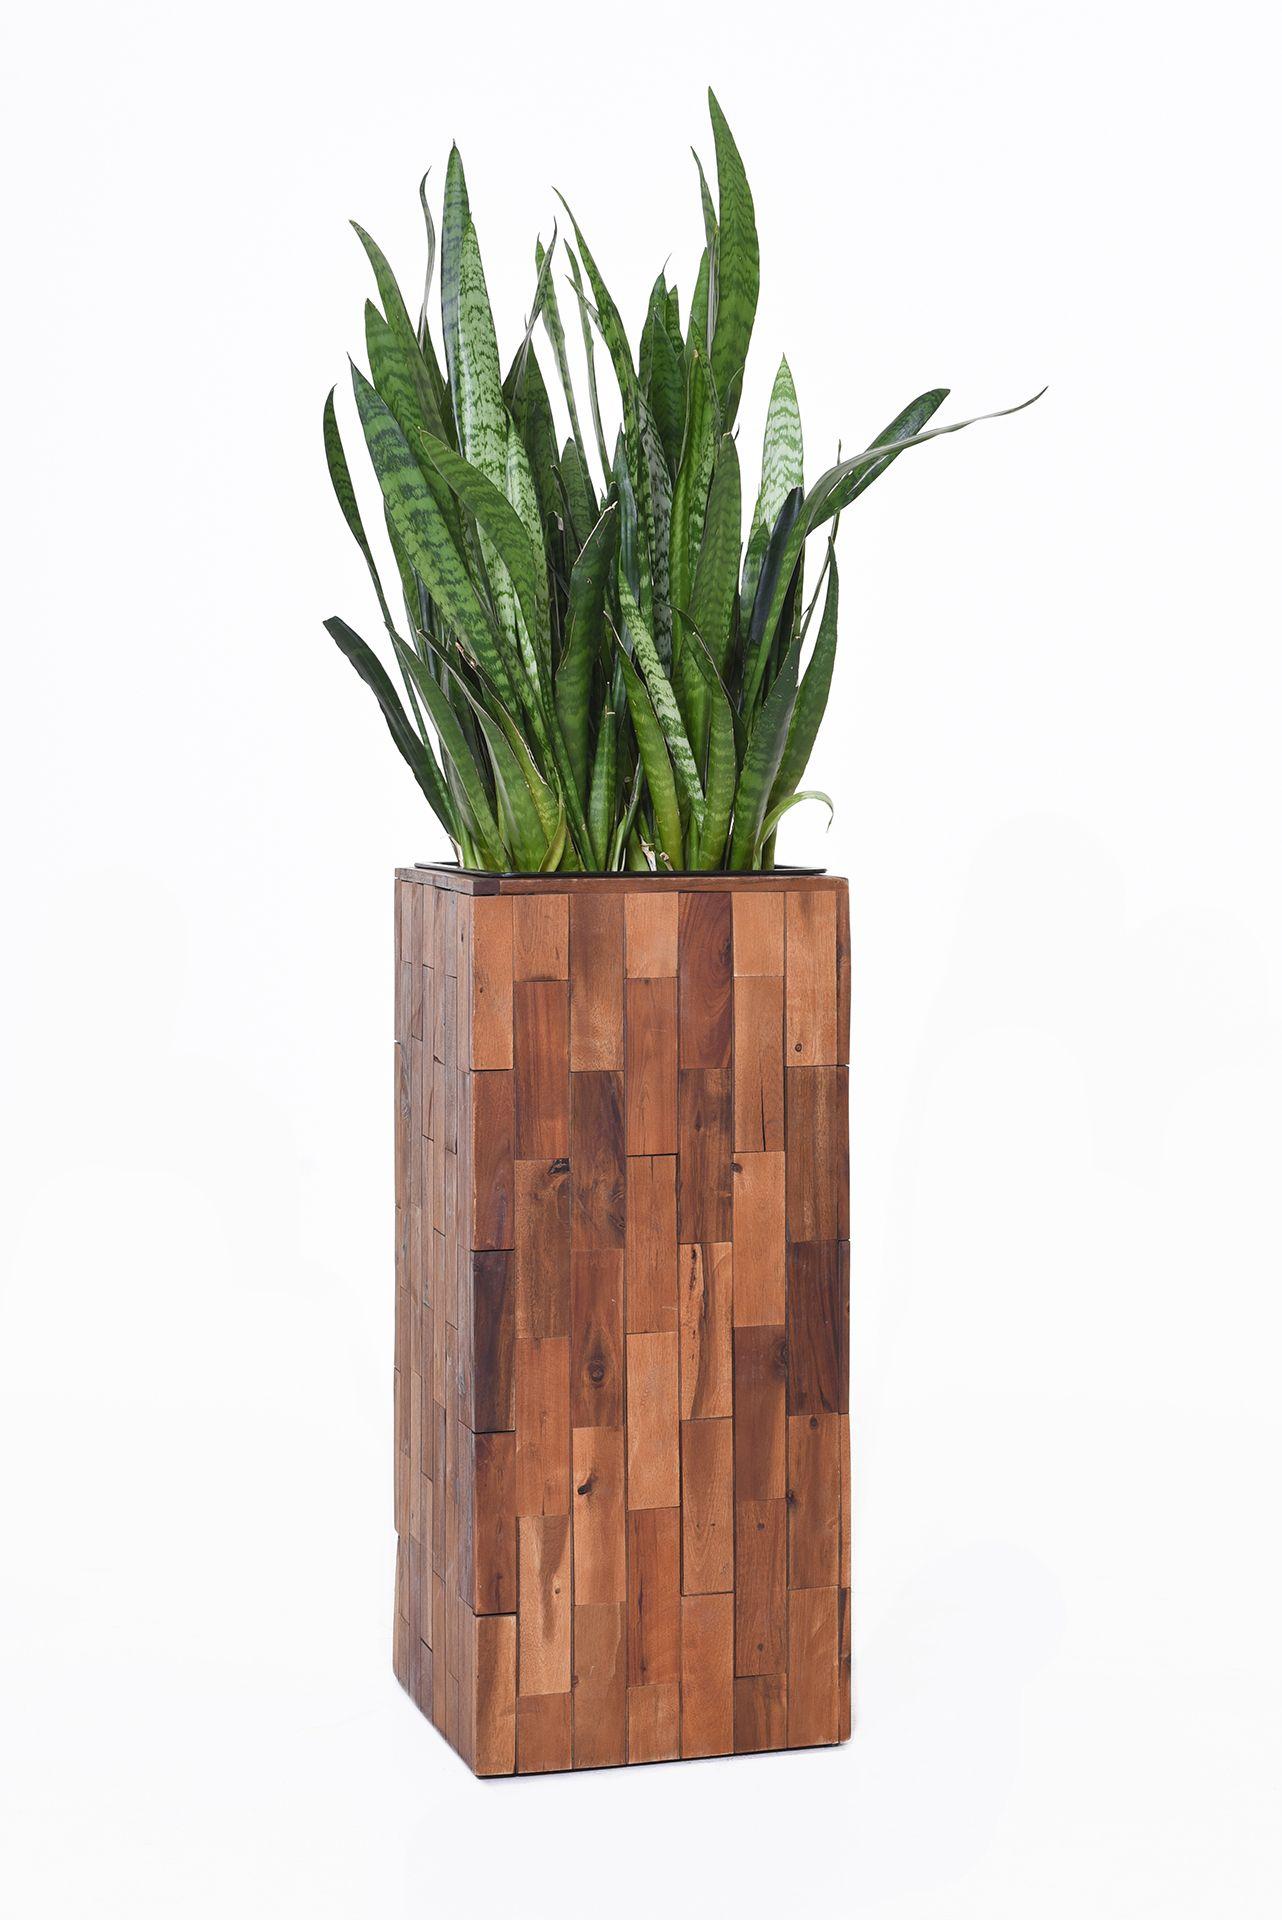 Pflanzkbel Blumenkbel Block Sule aus Holz Akazie 74